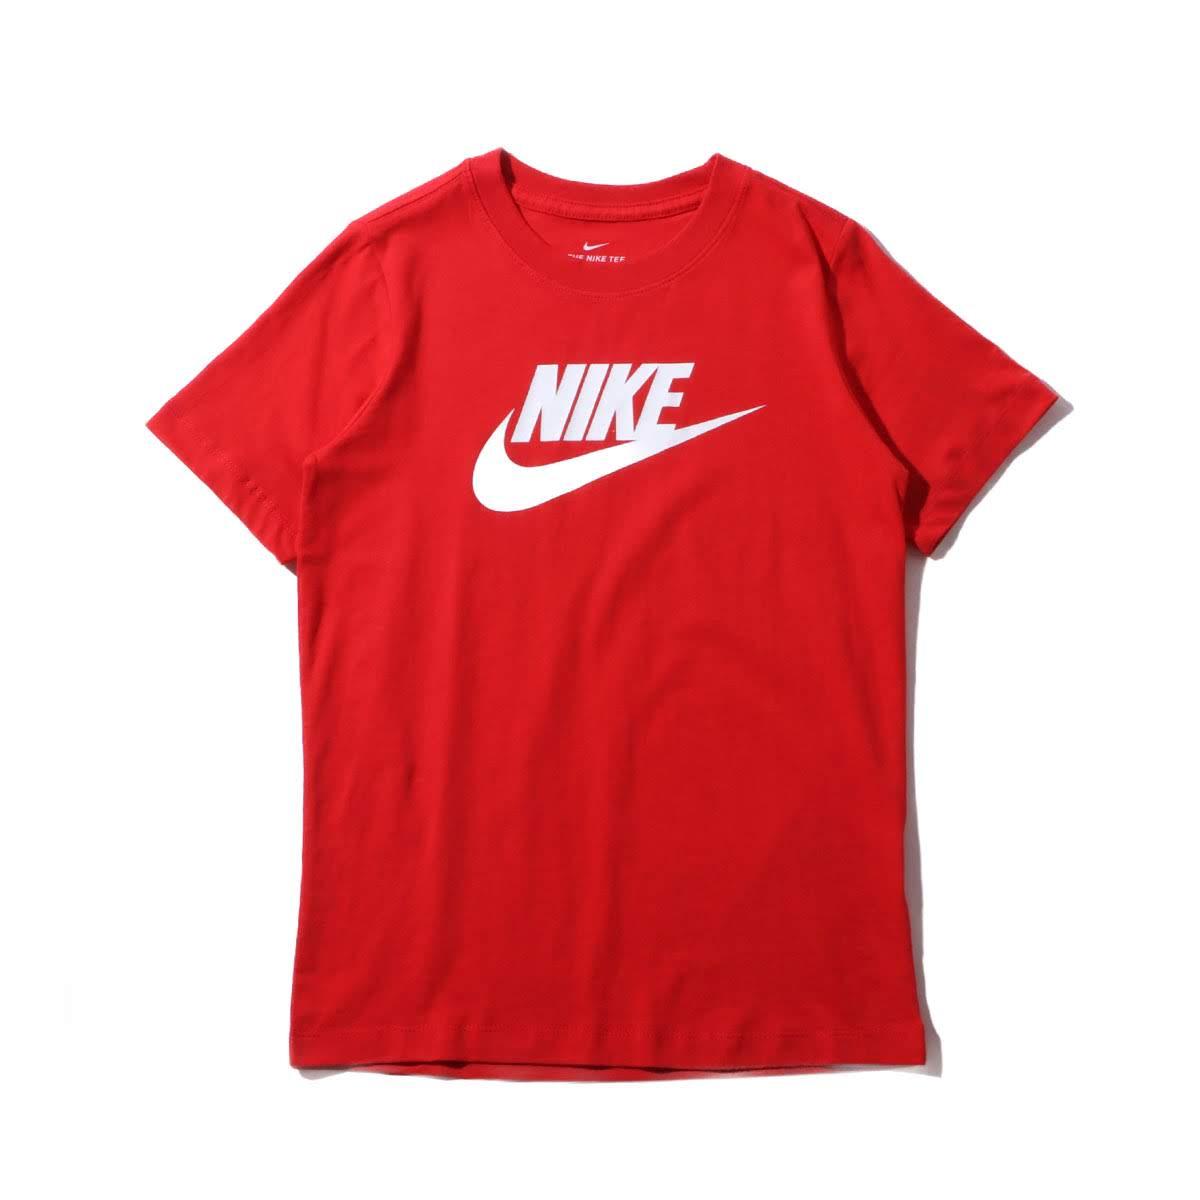 51c150f724a NIKE B NSW TEE FUTURA ICON TD (ナイキ YTH フューチュラ アイコン TD Tシャツ) UNIVERSITY RED  WHITE  キッズ Tシャツ